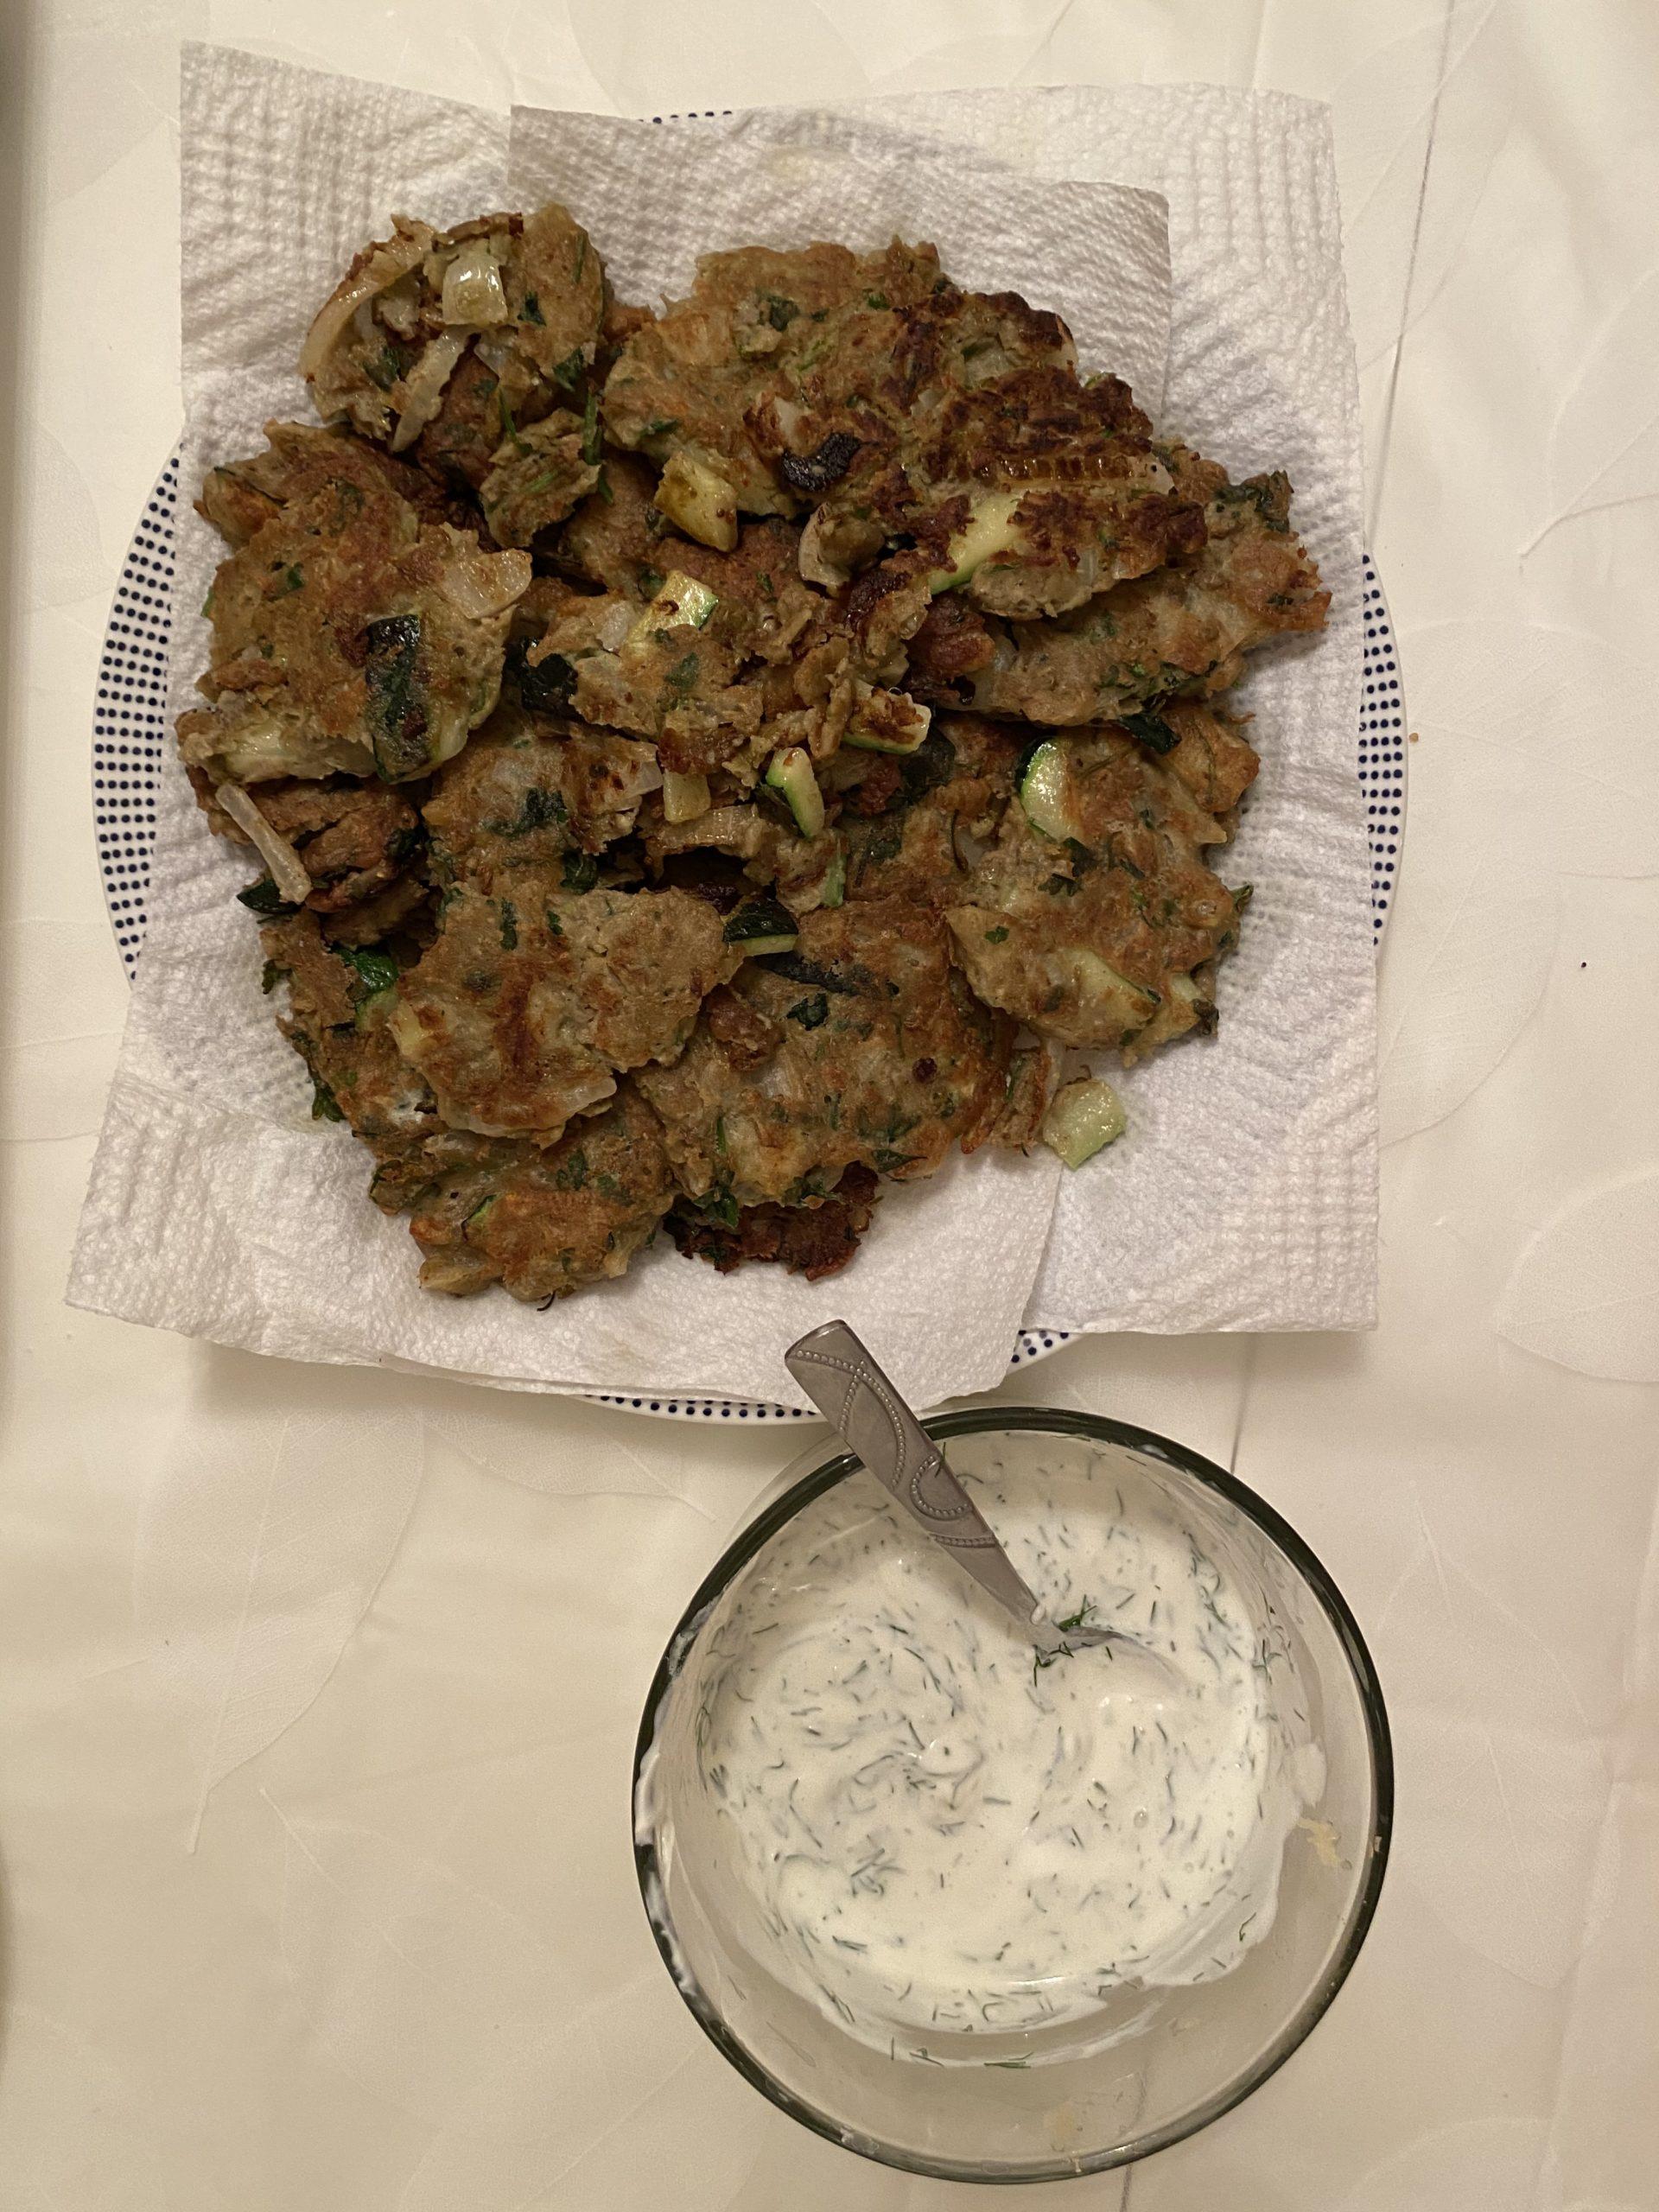 lentil zucchini fritters next to a bowl of yogurt sauce